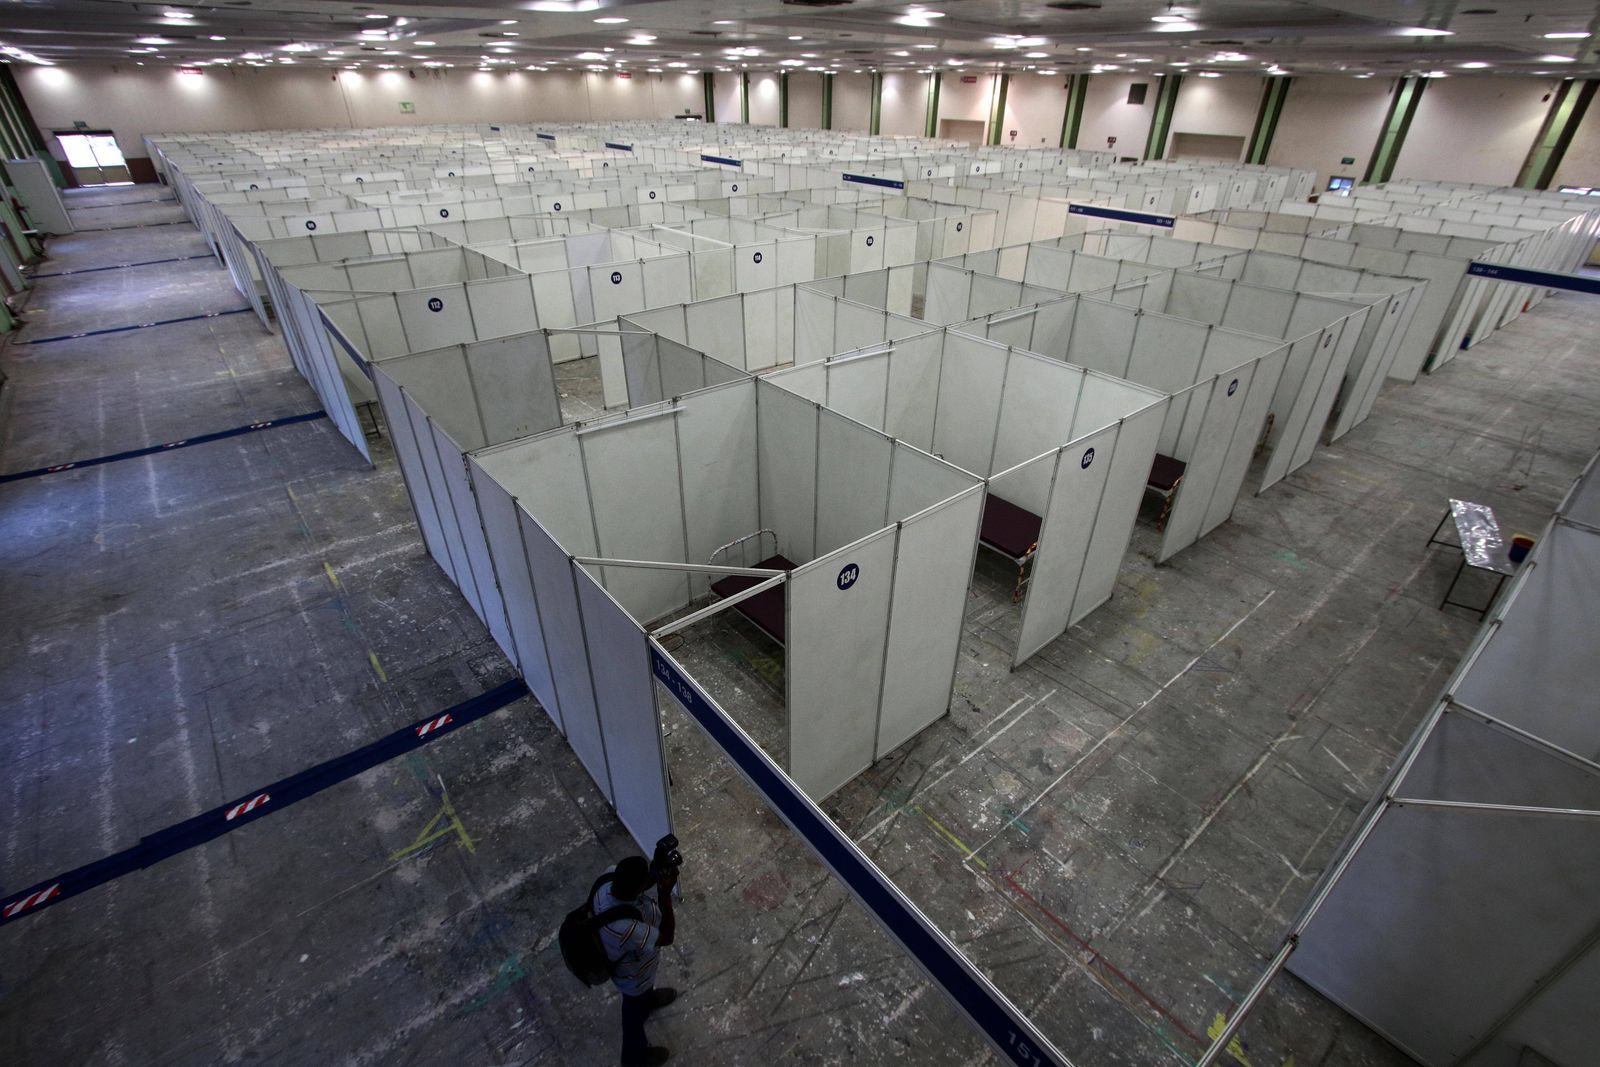 India: Quarantine center in Chennai Quarantine center at the Chennai Trade Center has been prepared by the Chennai Corp